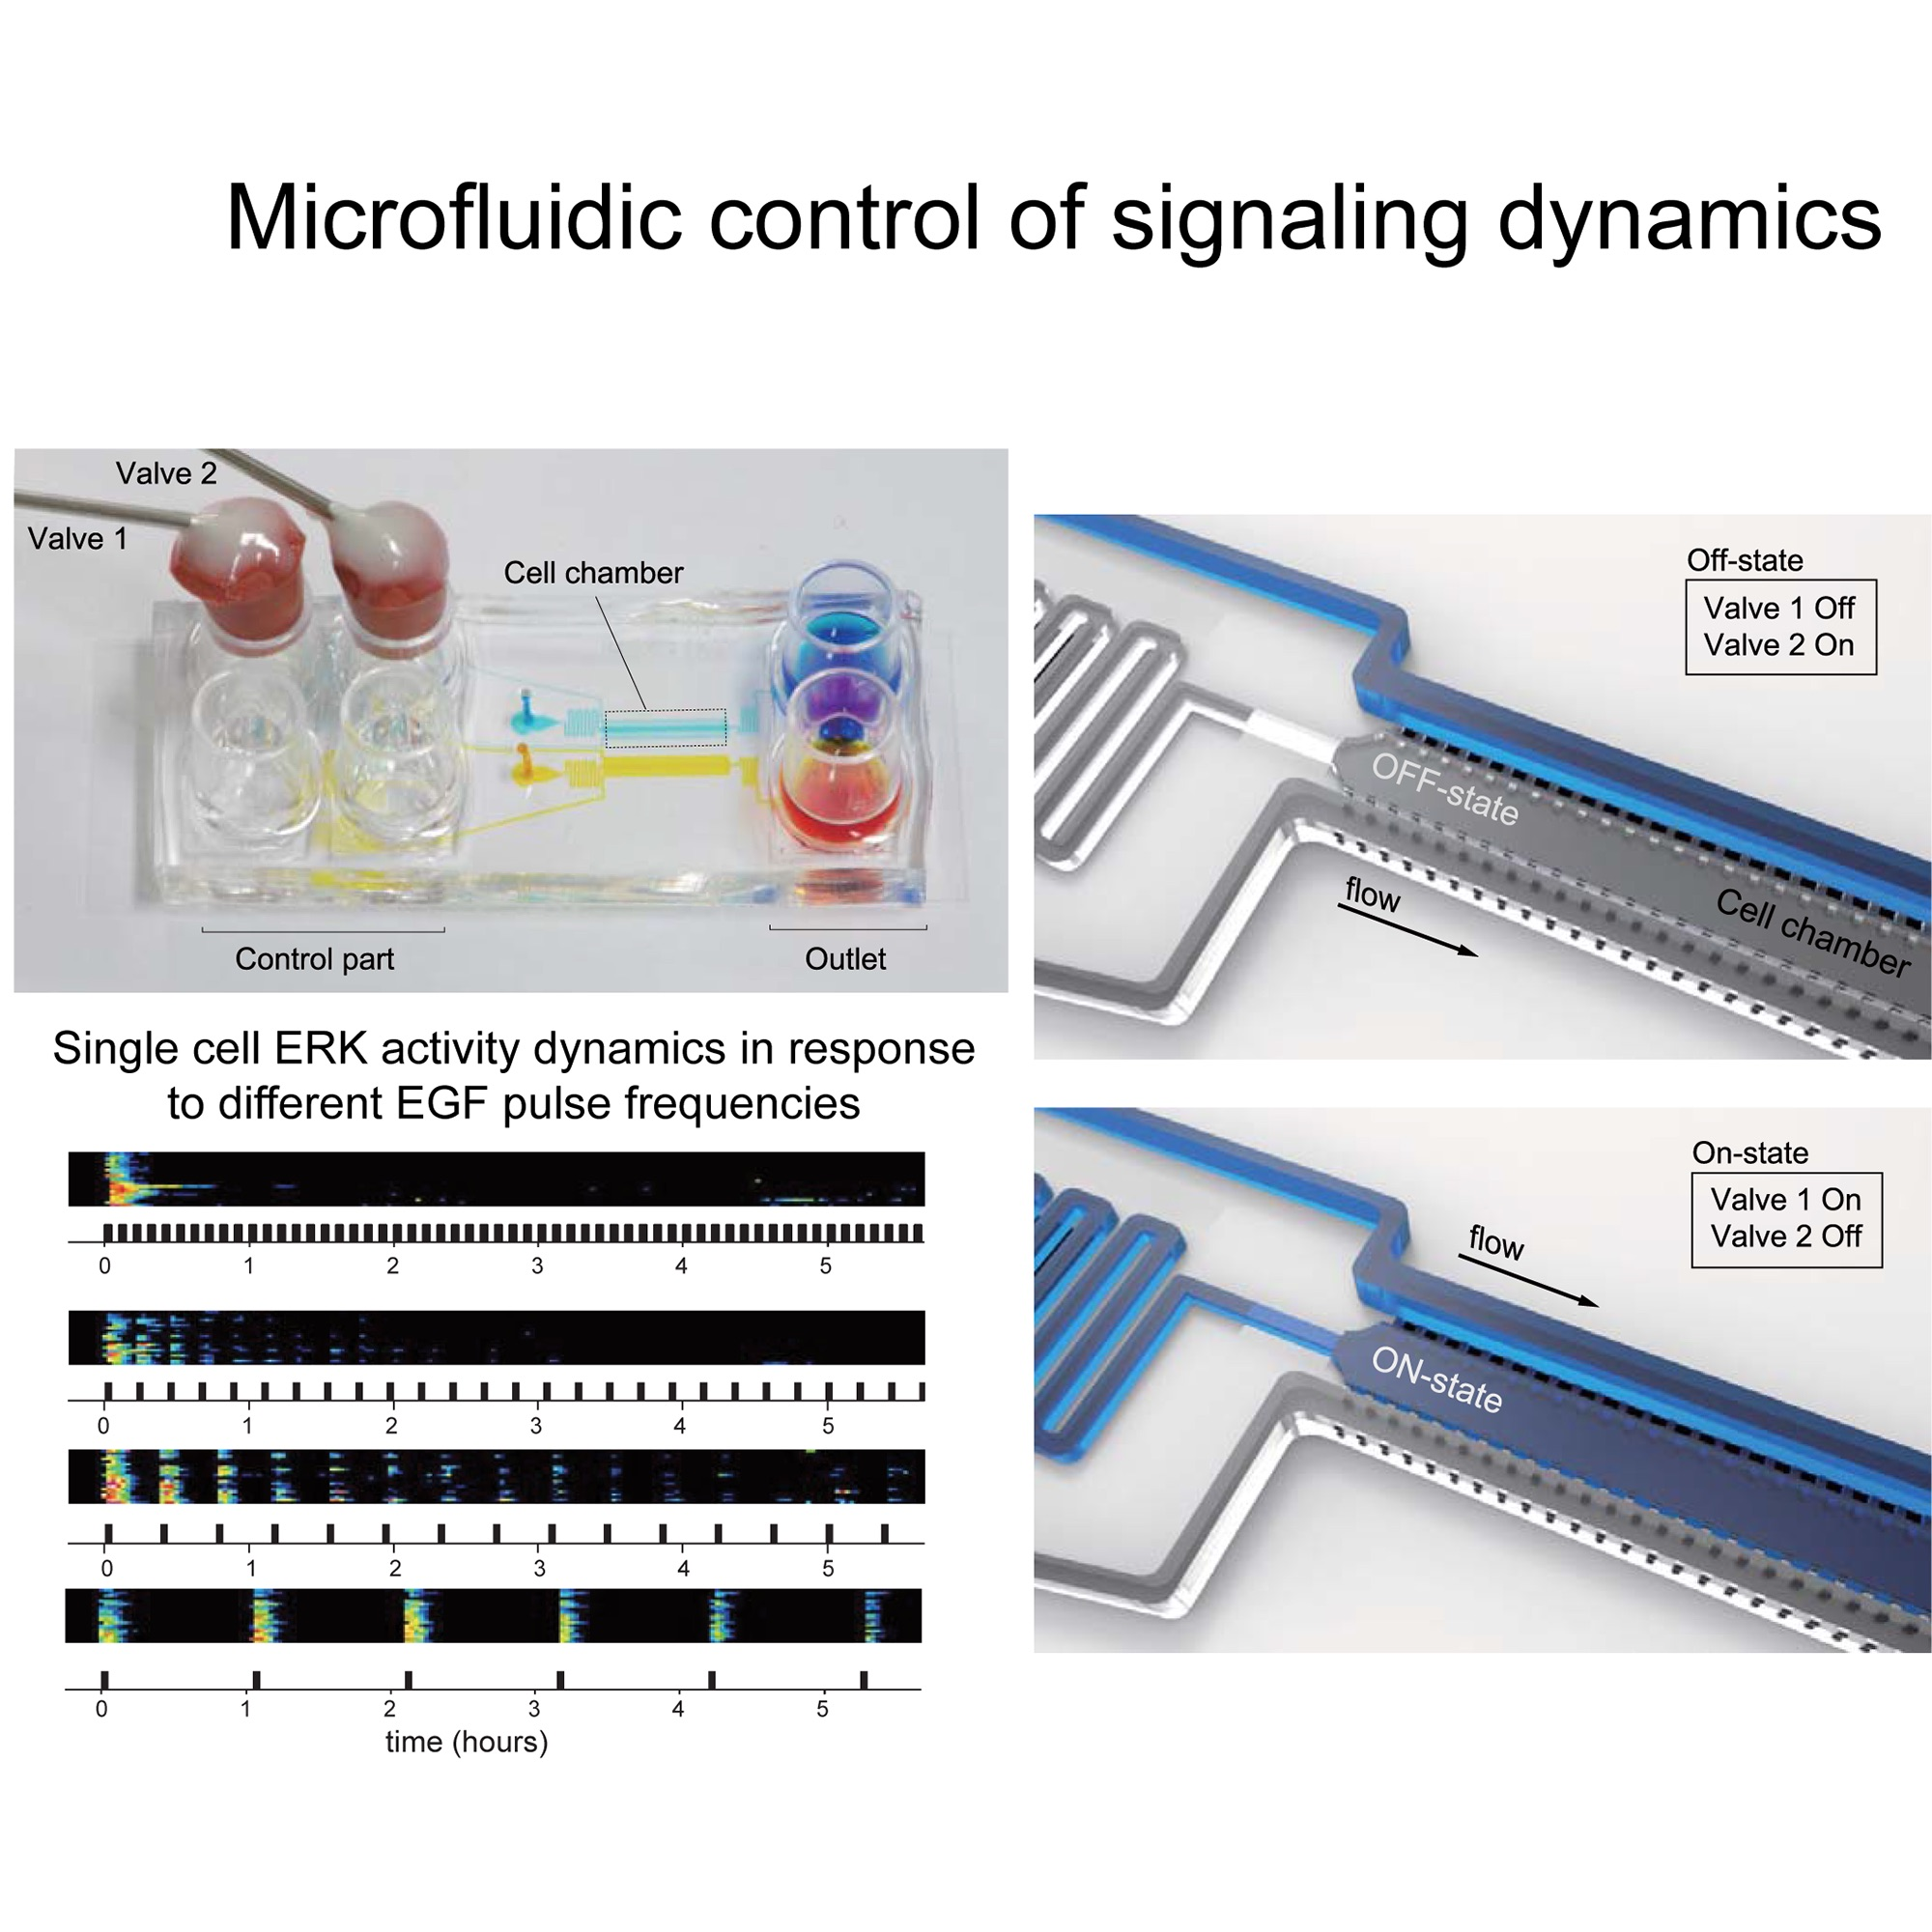 microfluidic control 2000x2000 copy.jpg